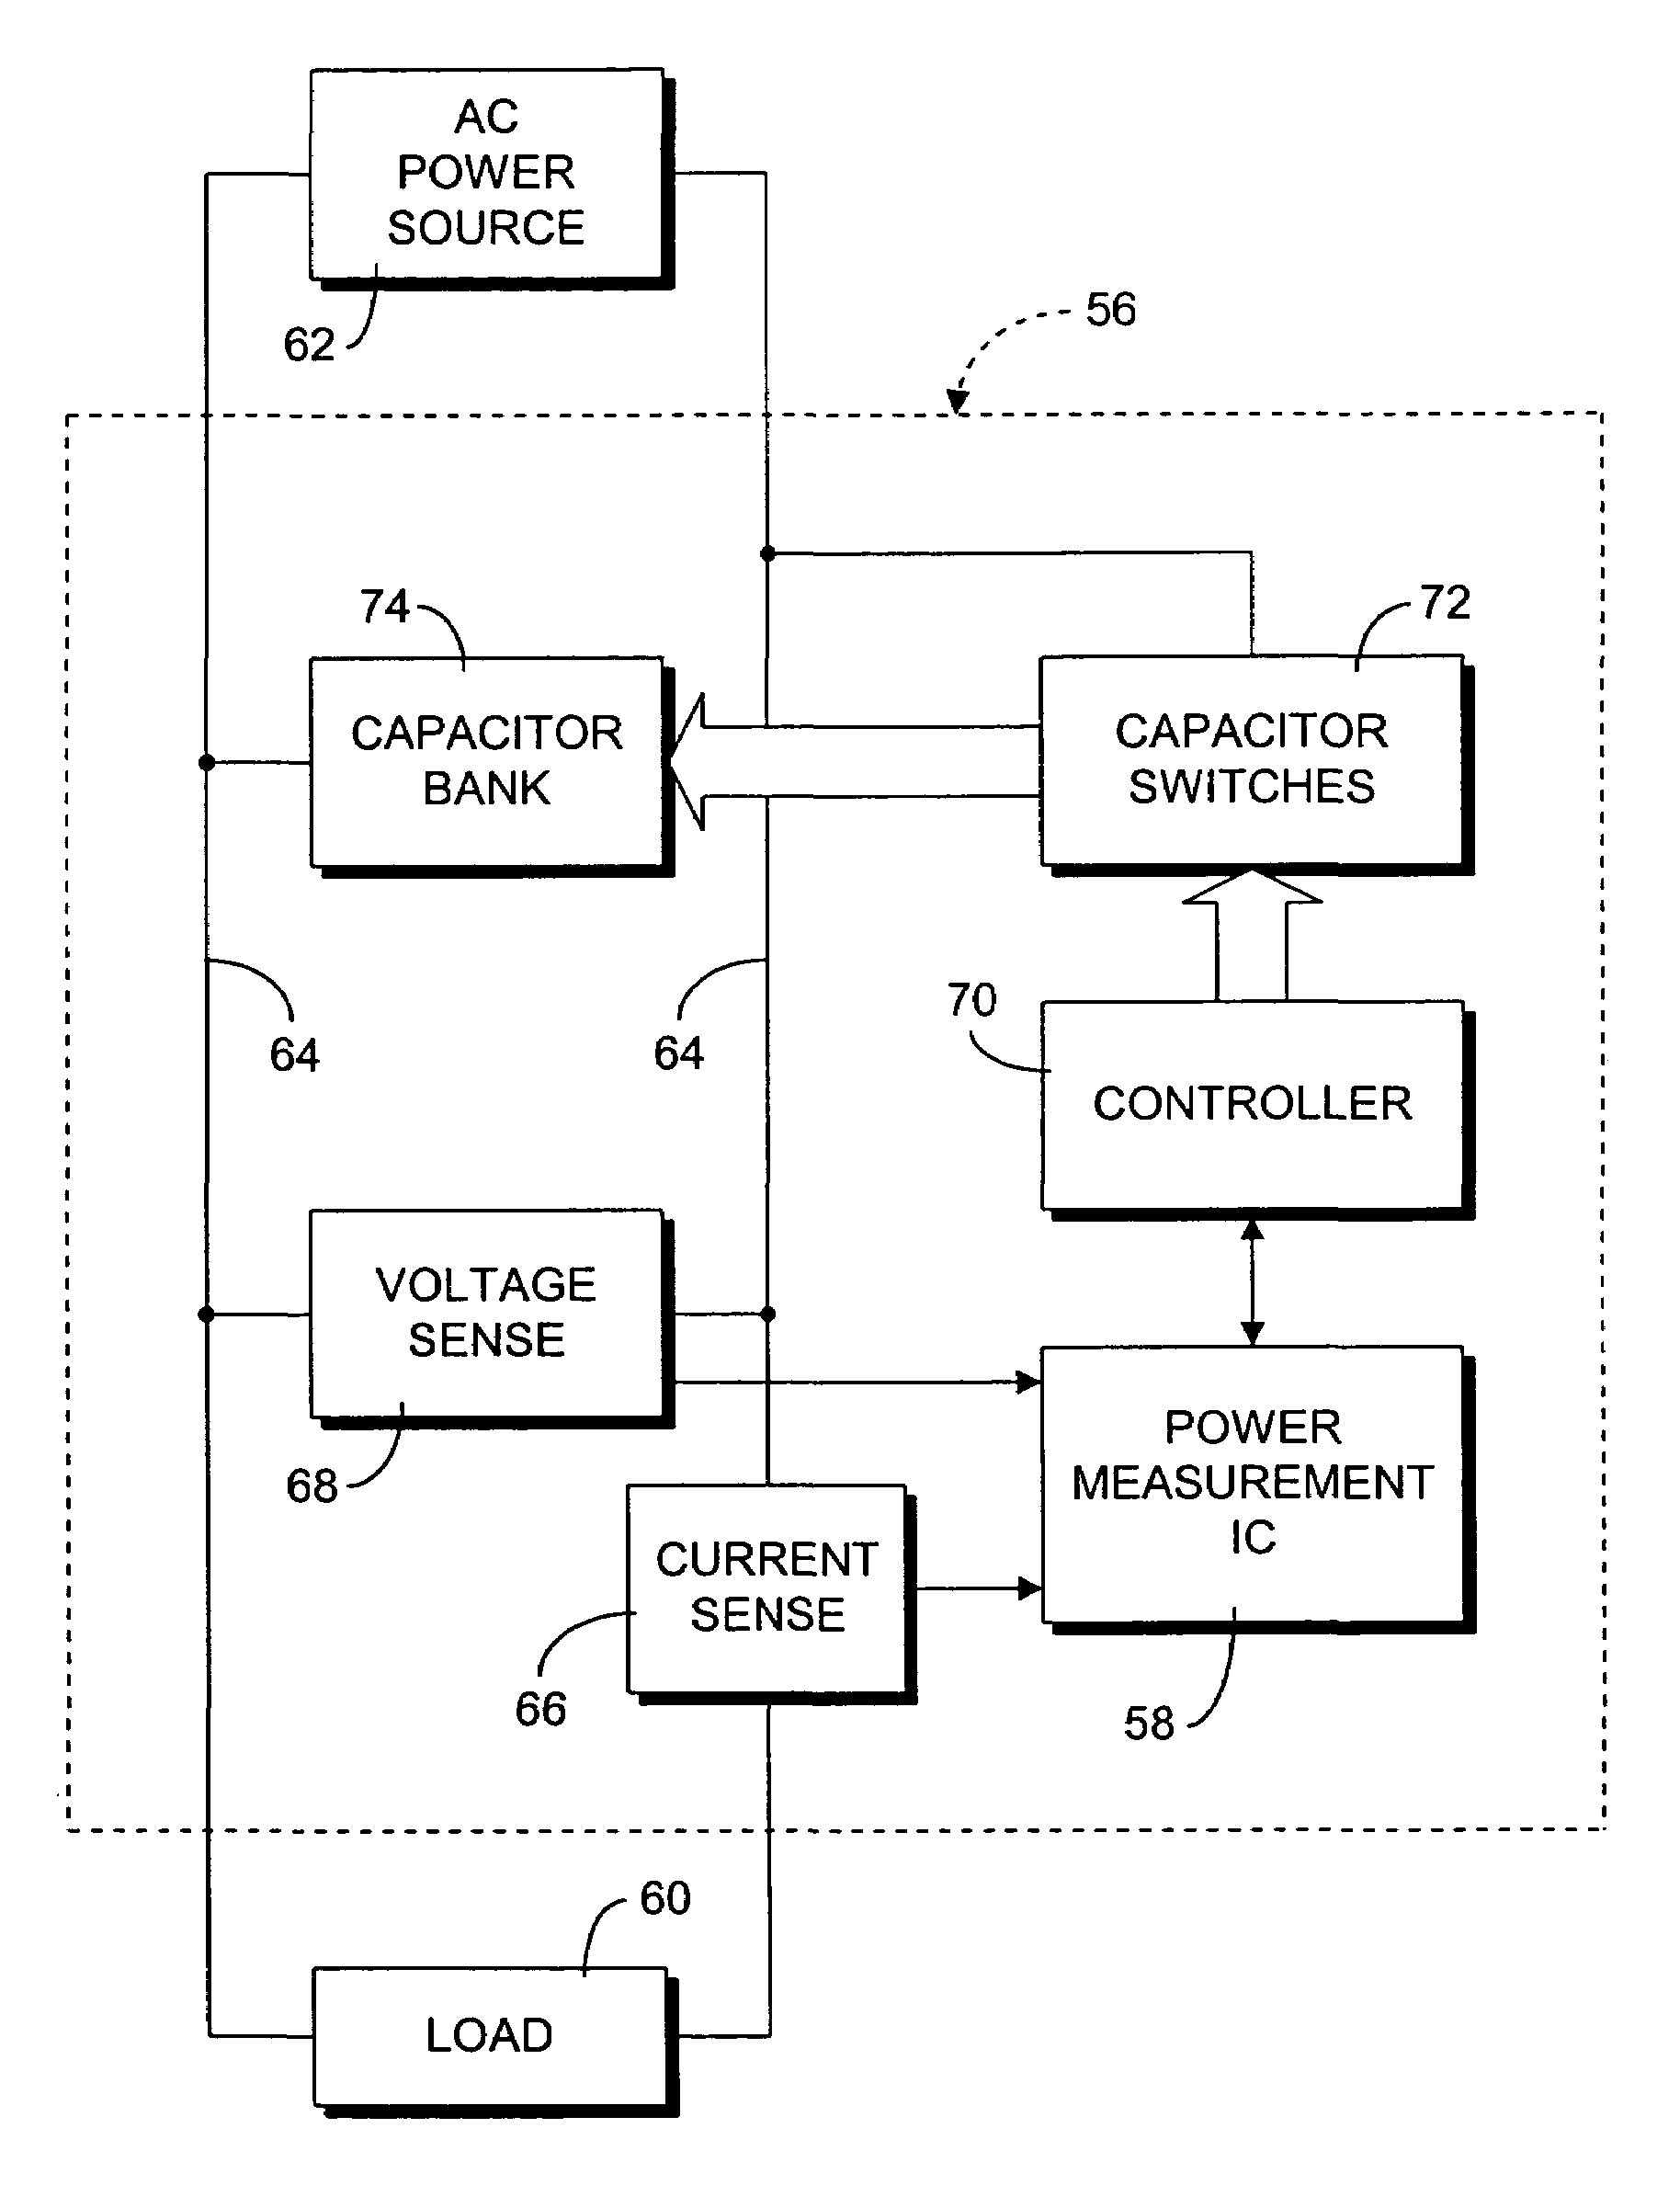 Power Factor Capacitor Bank Wiring Diagram Virtual Circuit And Schematics